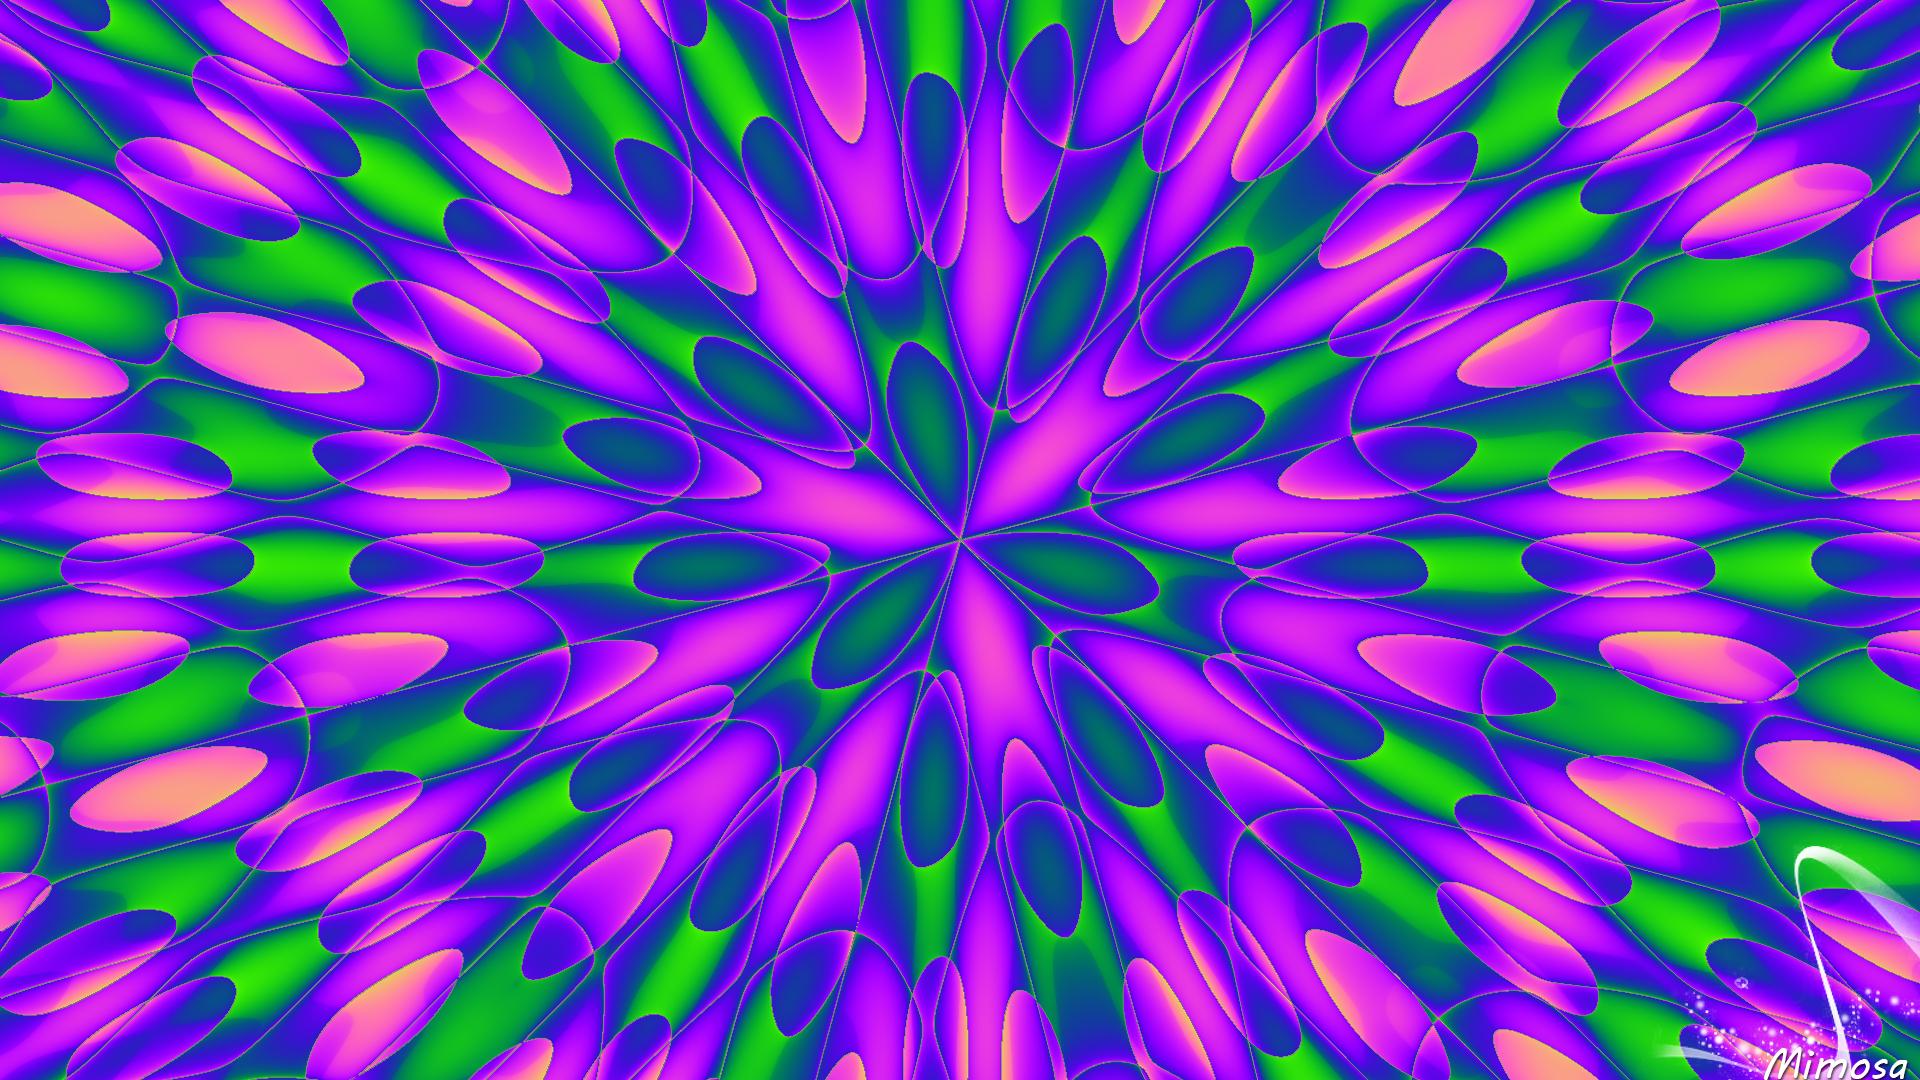 Artistic Digital Art Colors Pattern Colorful 1920x1080